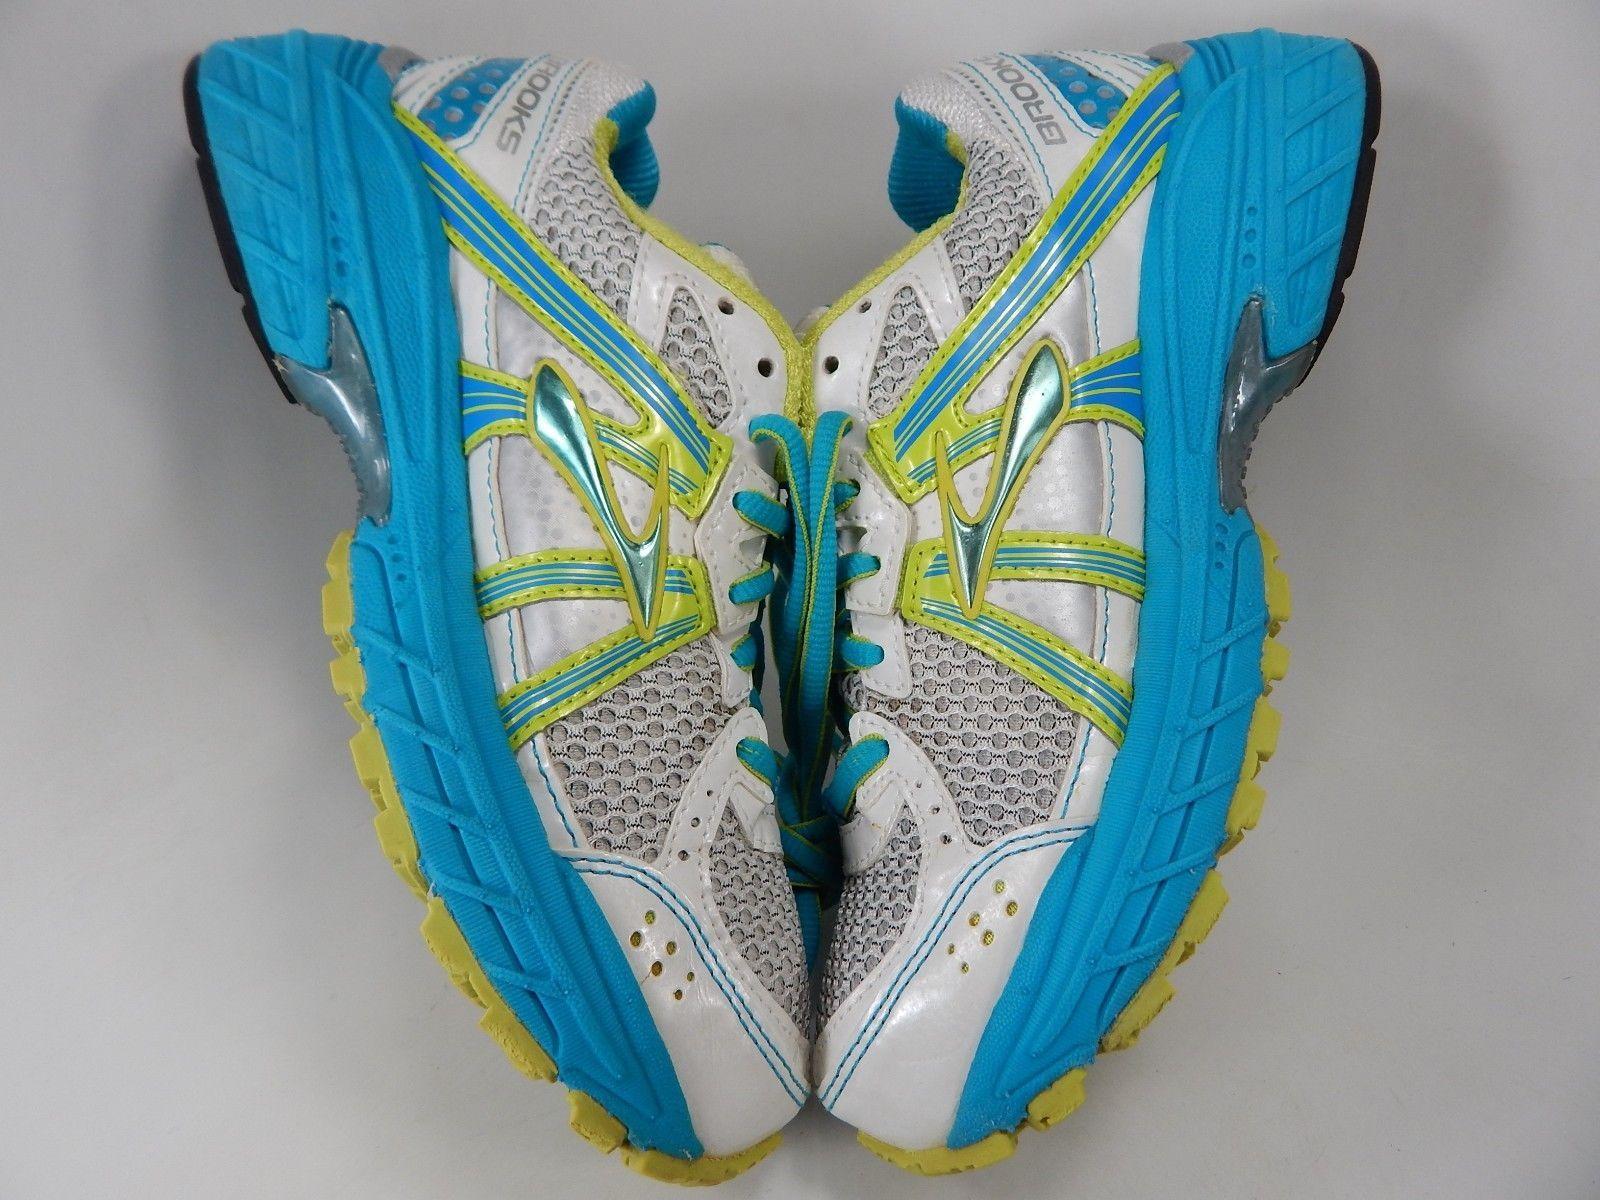 Brooks Defyance 7 Sz US 6 M (B) EU 36.5 Women's Running Shoes White 1201481B331